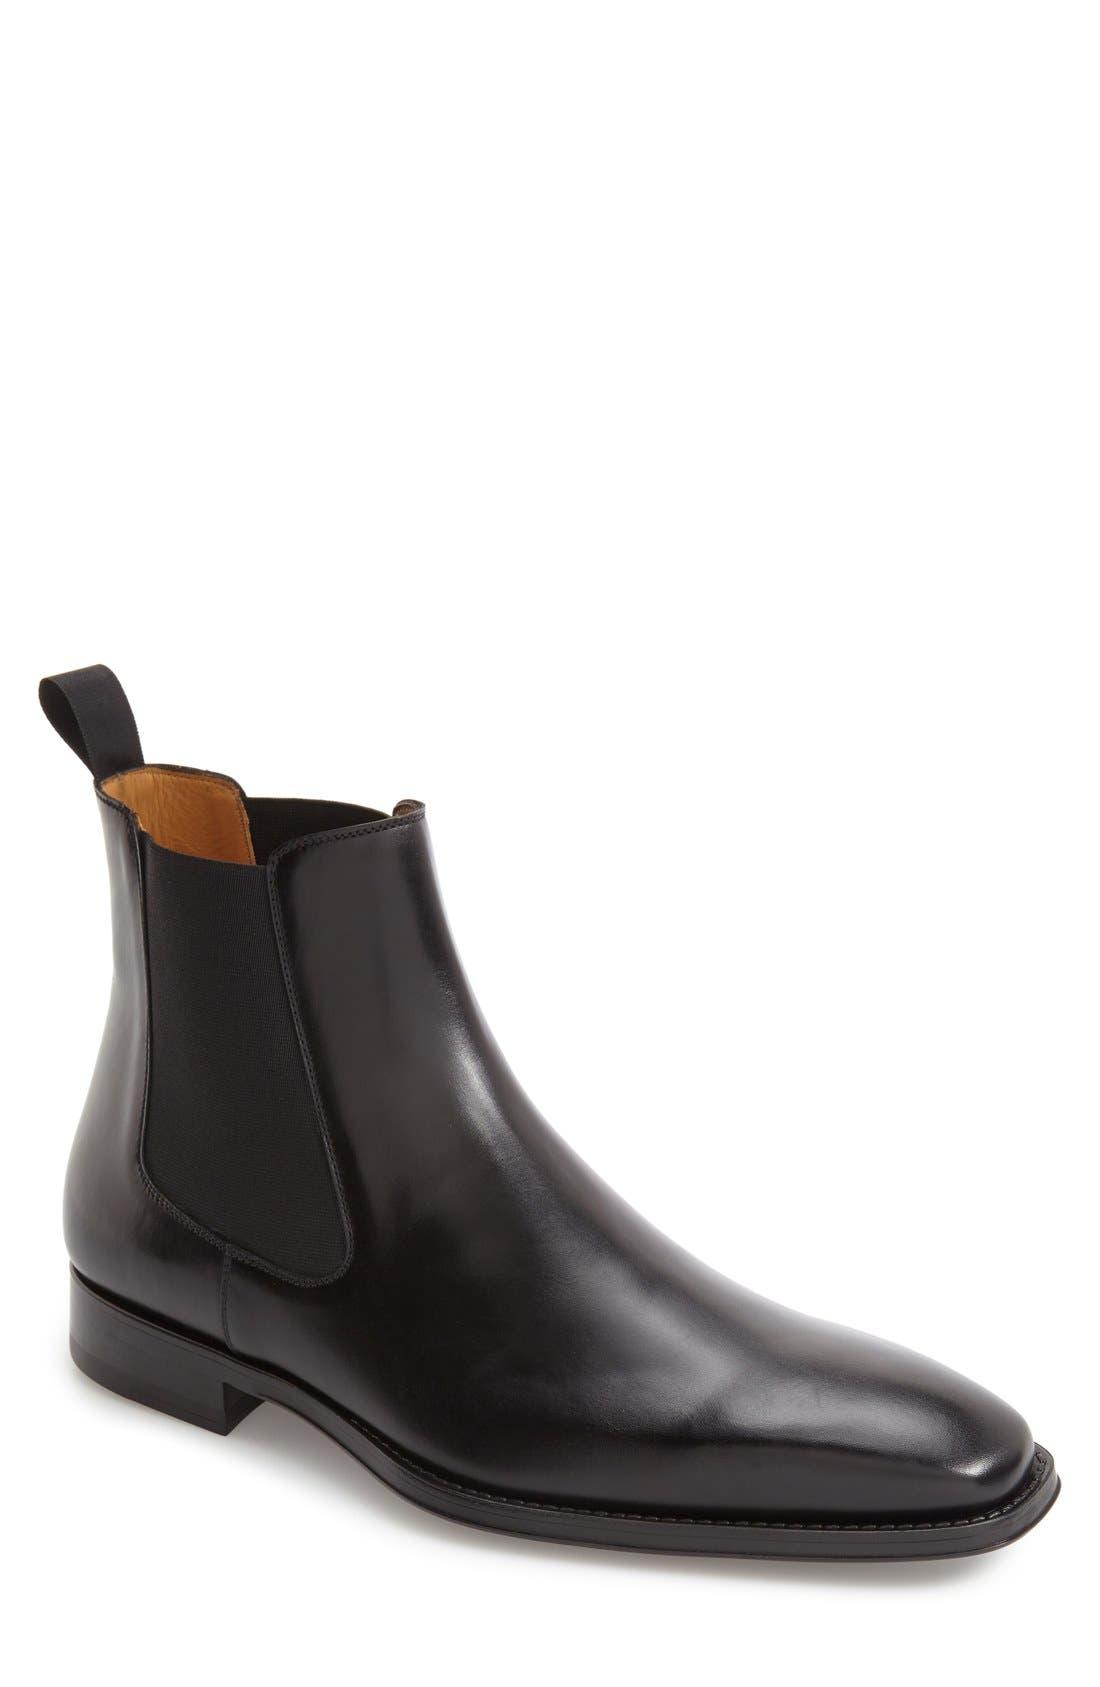 'Sean' Chelsea Boot, Main, color, BLACK